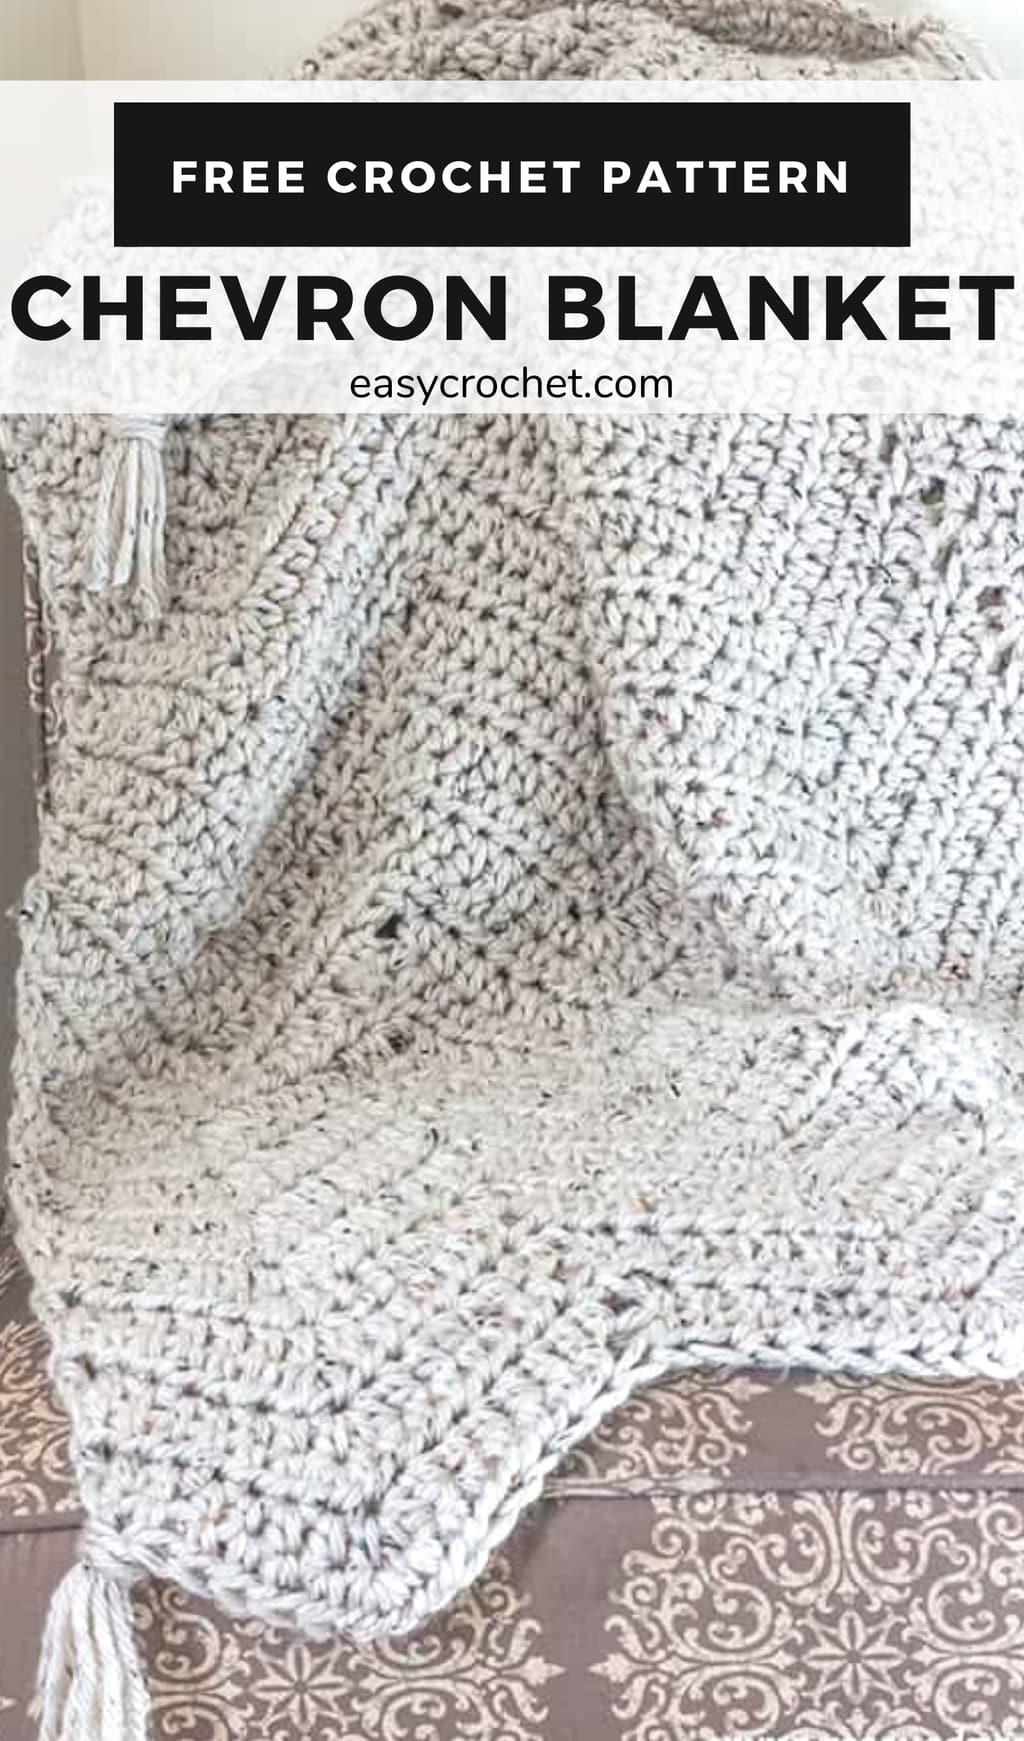 bulky chevron crochet blanket pattern